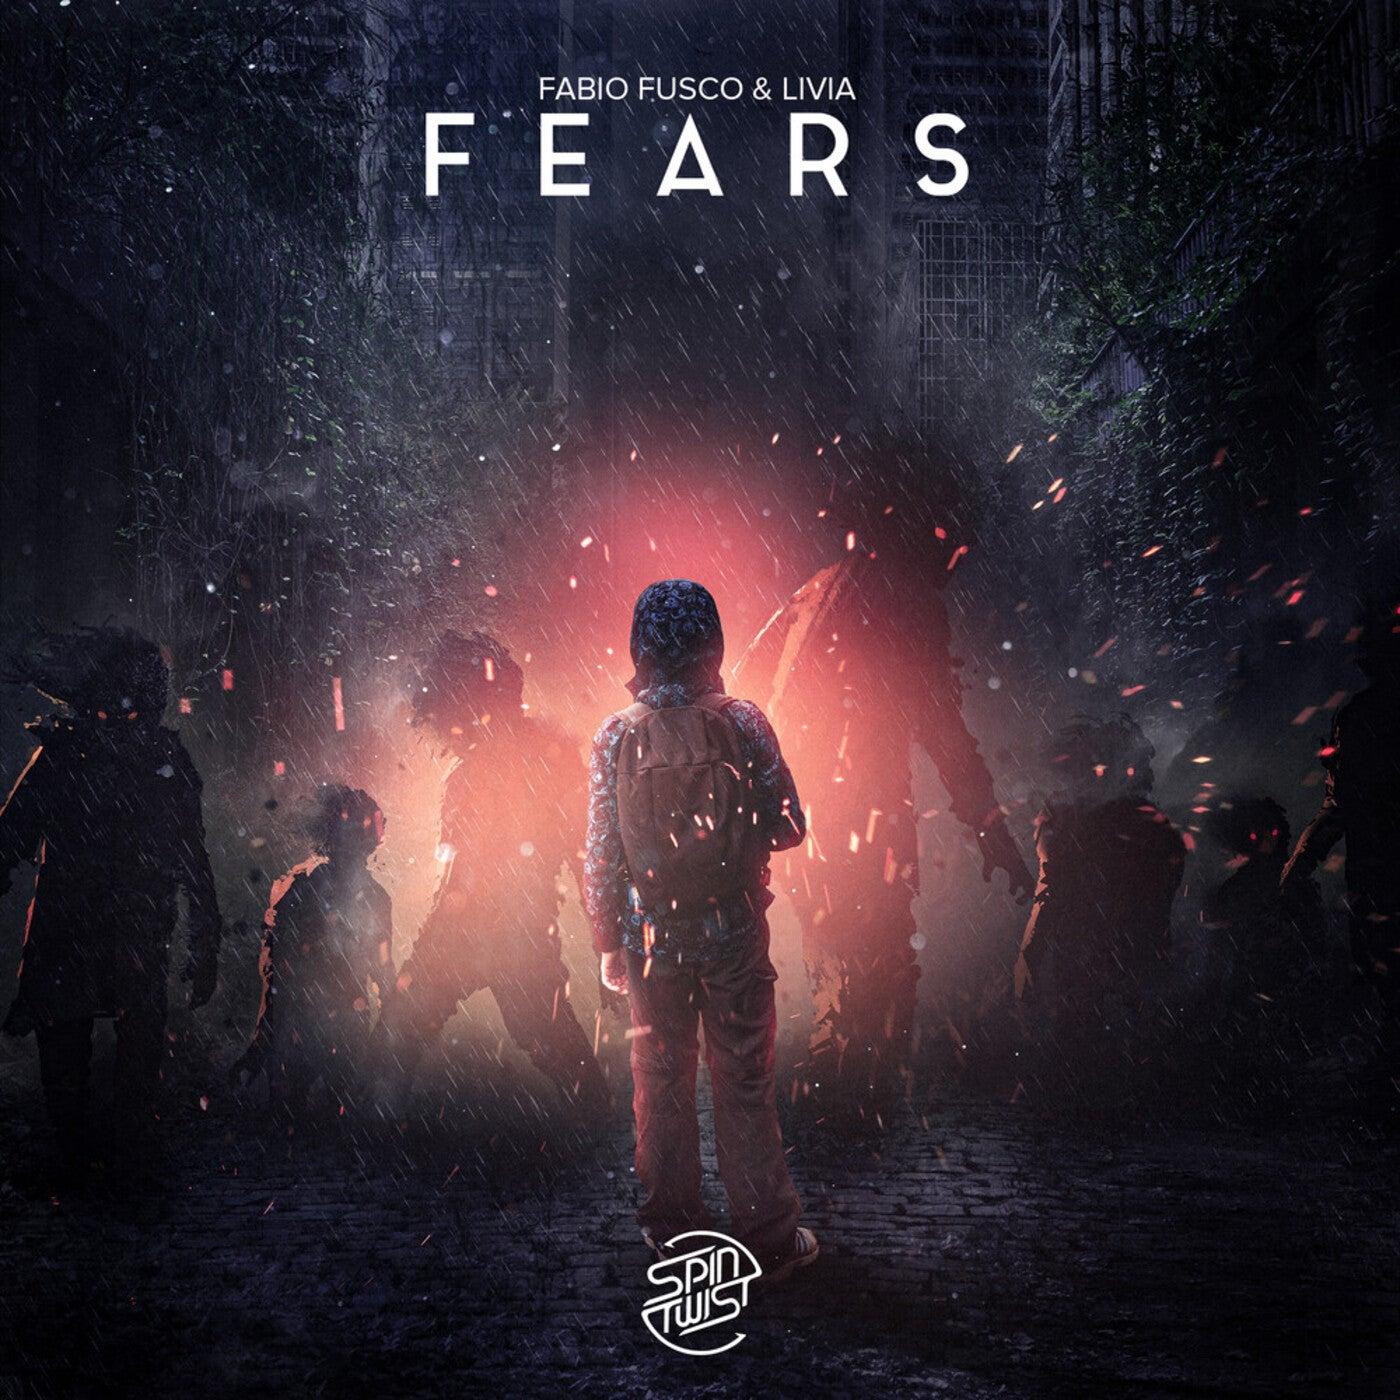 Fears (Original Mix)